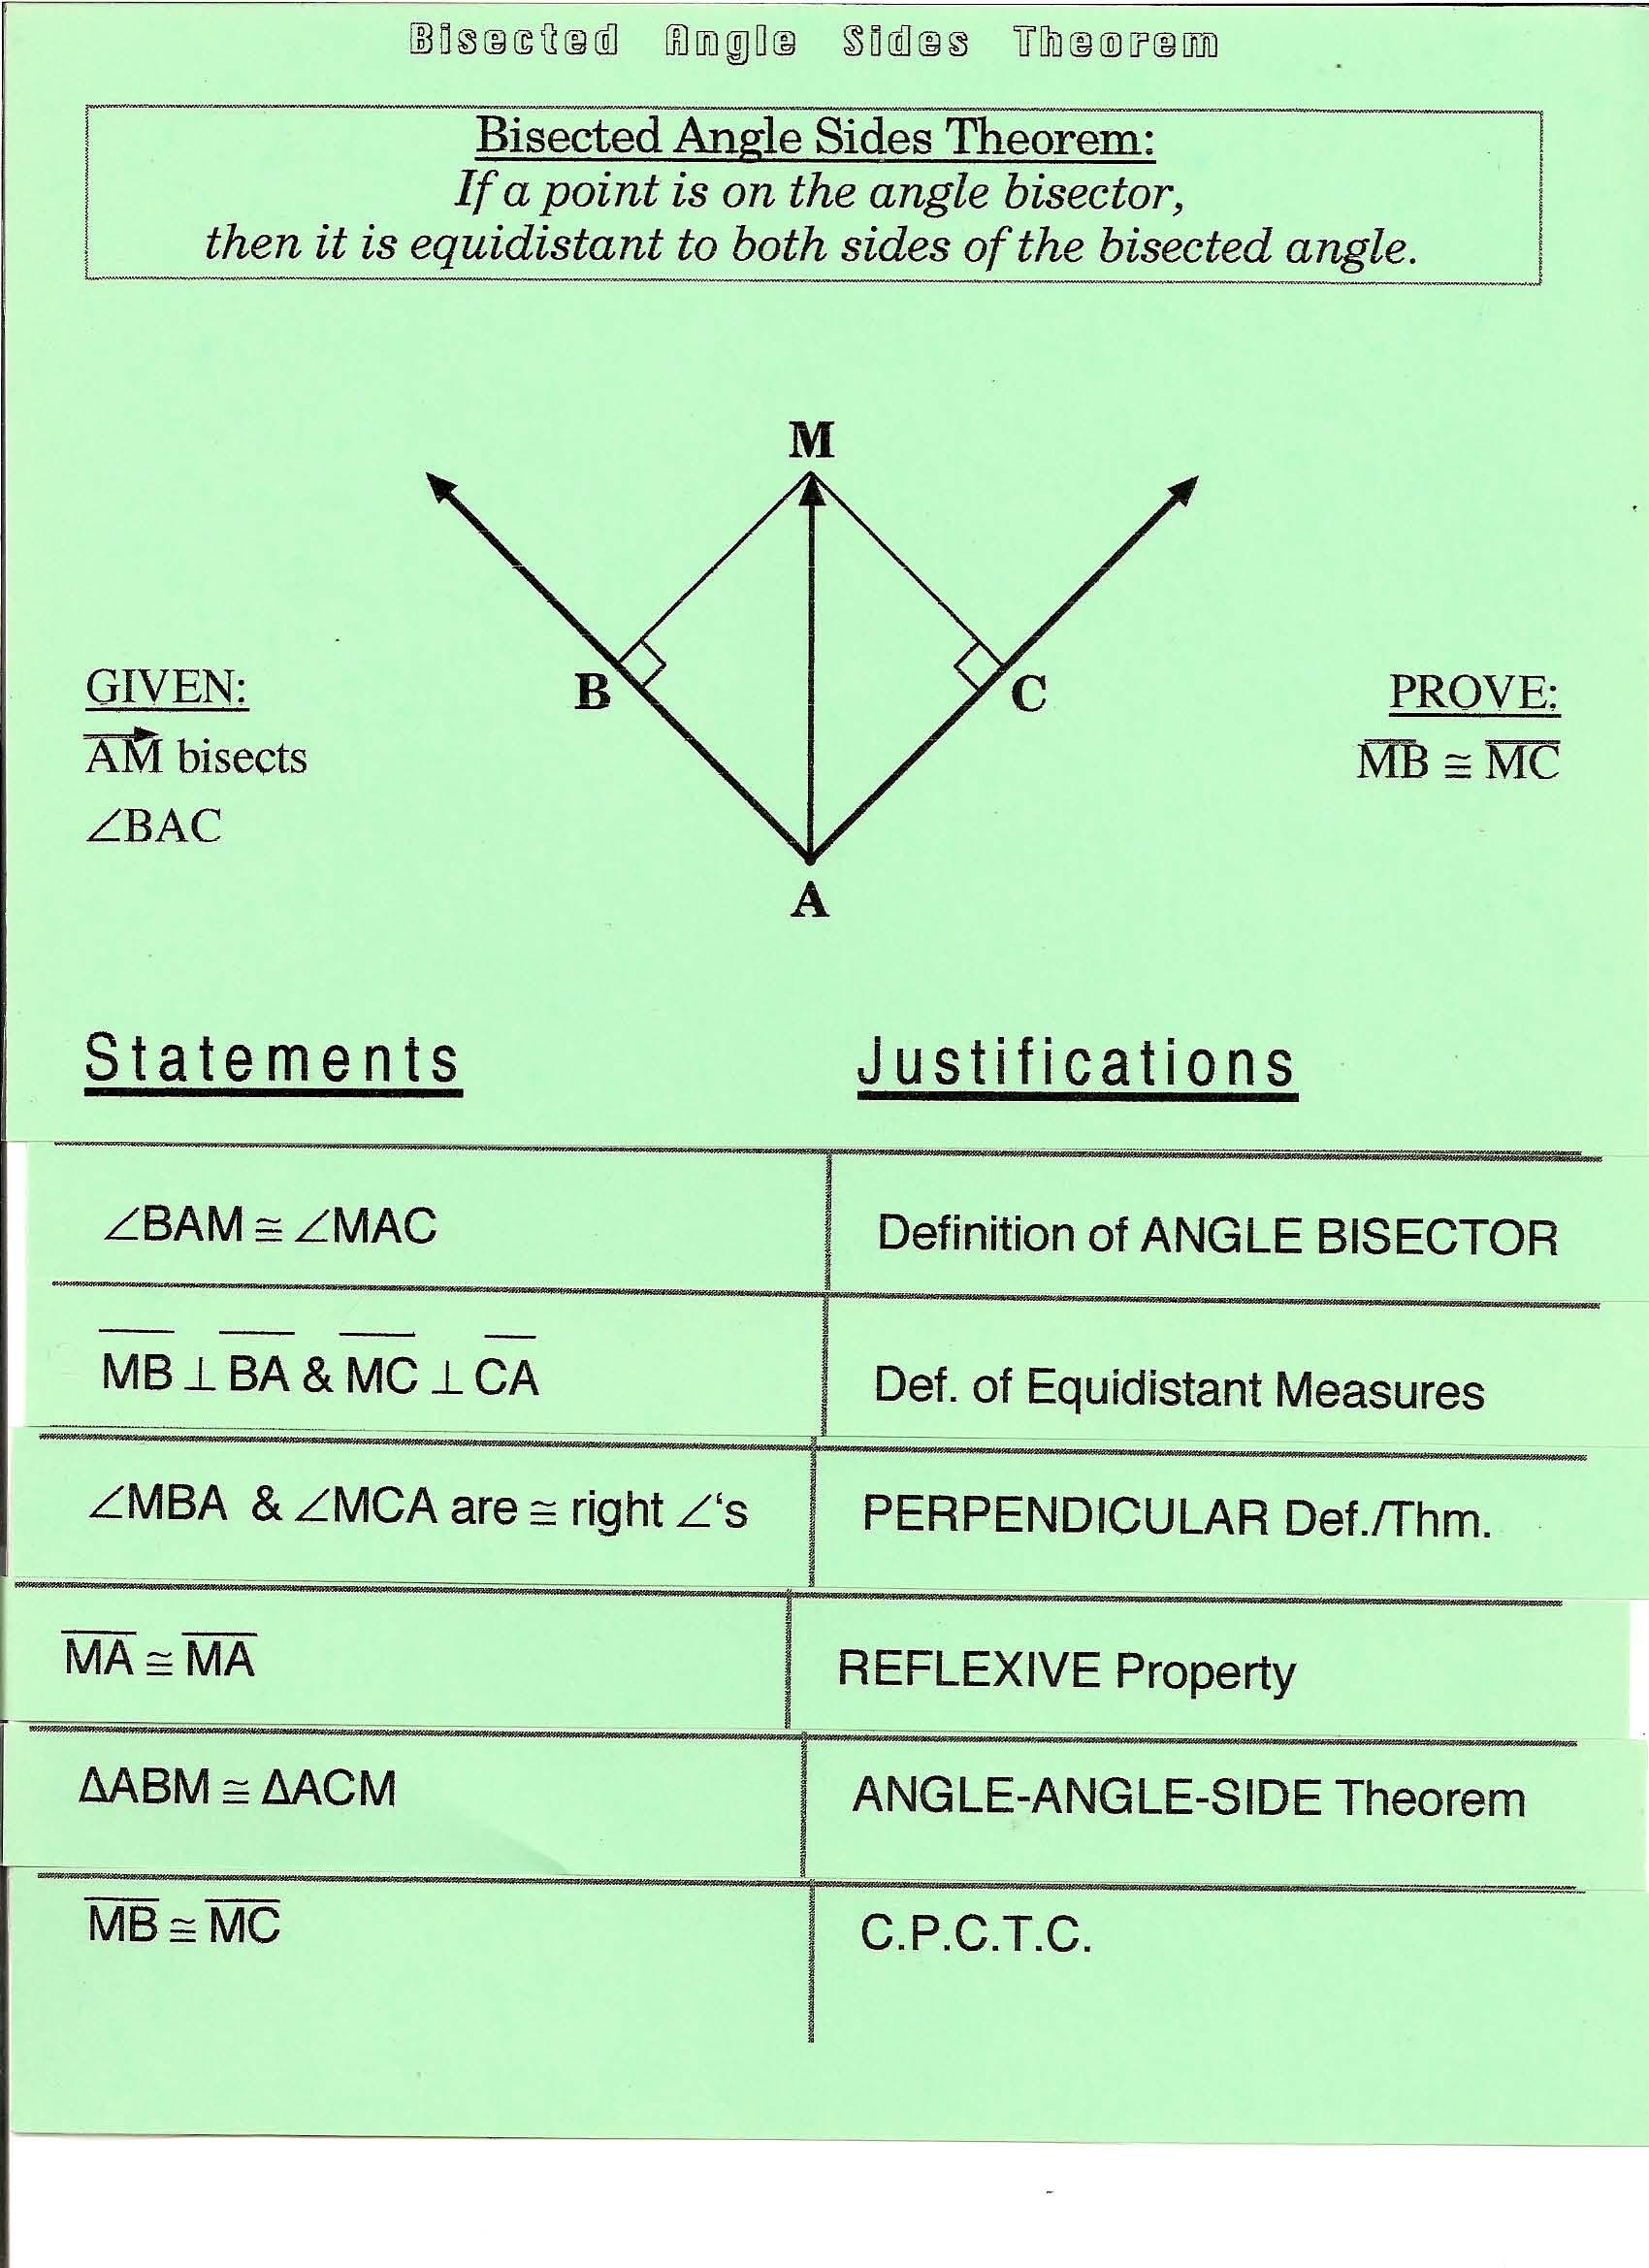 Triangle Inequality theorem Worksheet Gebhard Curt G S